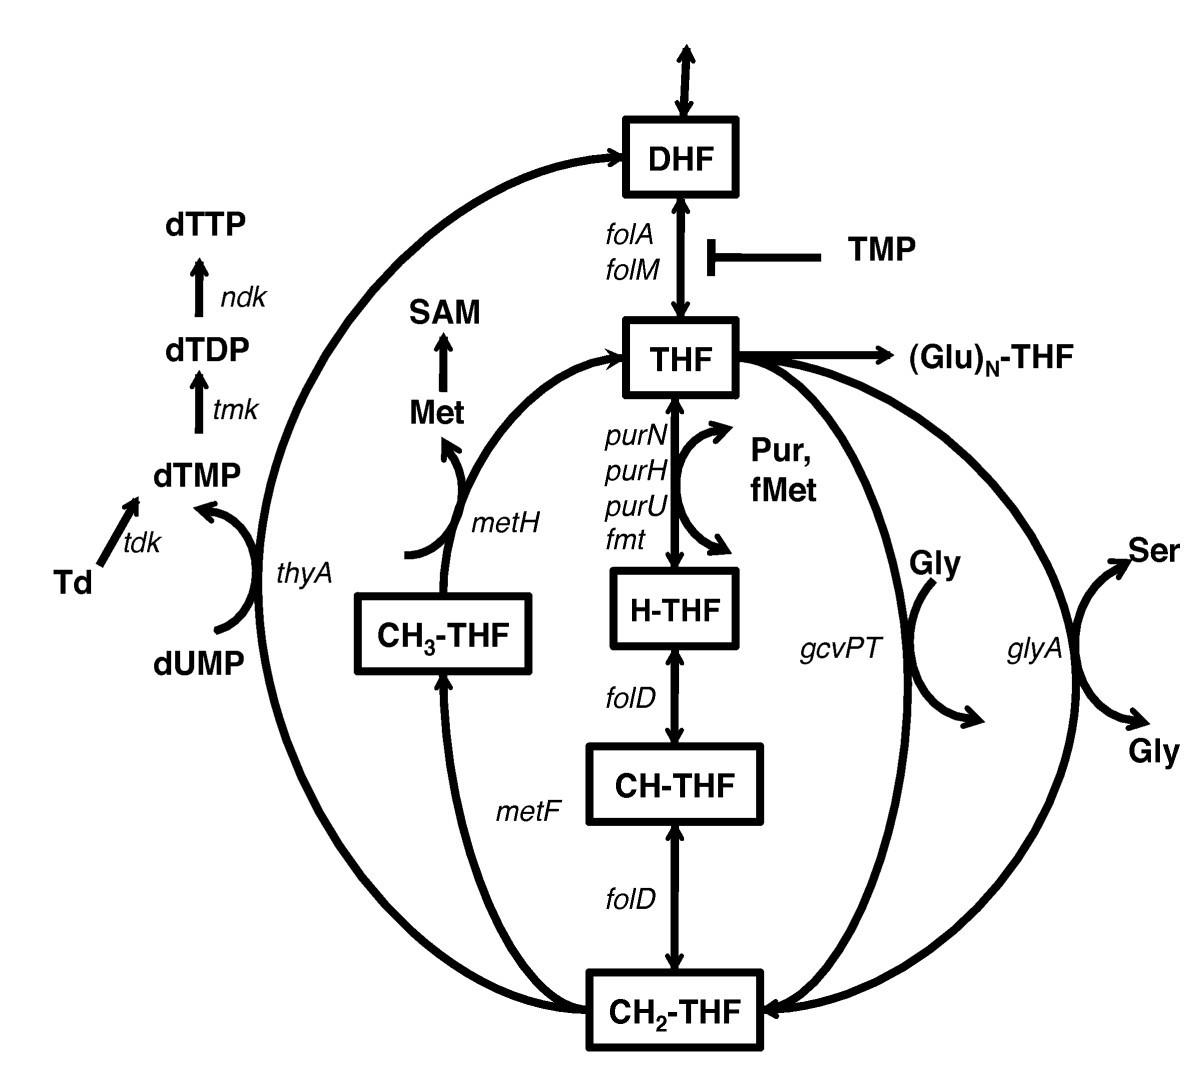 The Association Of Dna Damage Response And Nucleotide Level Jacinto 6 Block Diagram Figure 1